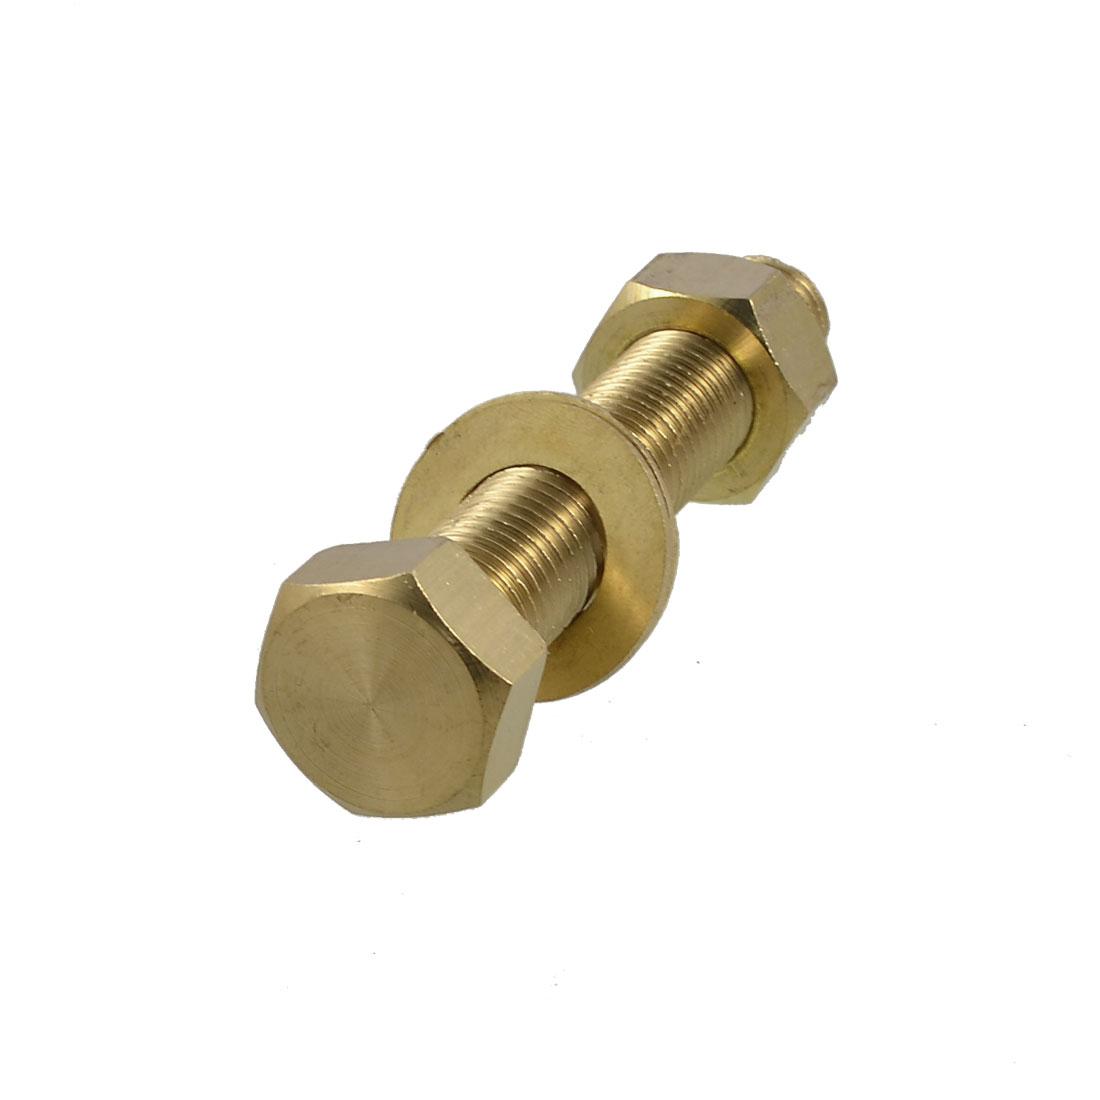 Hex Head Nut 16mm x 90mm Threaded Brass Screw Bolt w 2 Washers